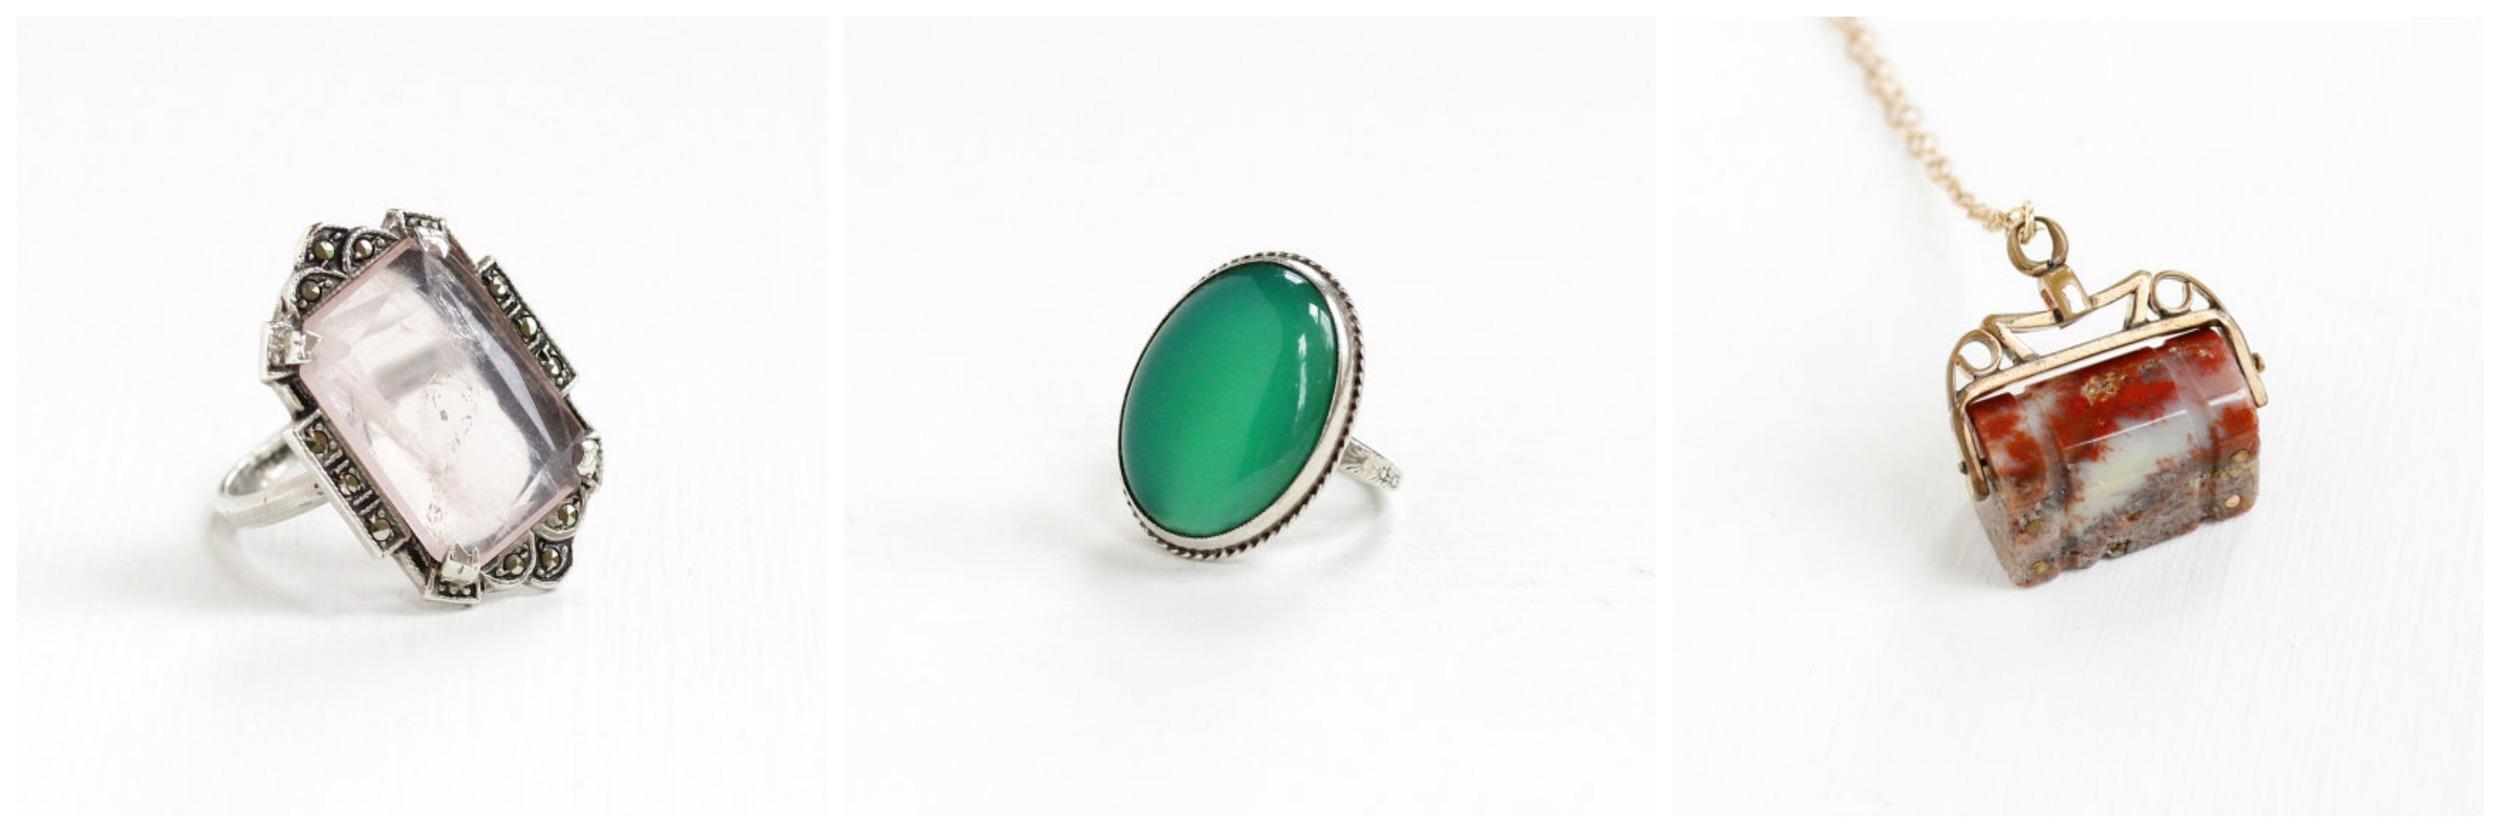 Vintage  Rose Quartz Ring ,Vintage  Chrysoprase Ring , Antique  Agate Spinner Fob